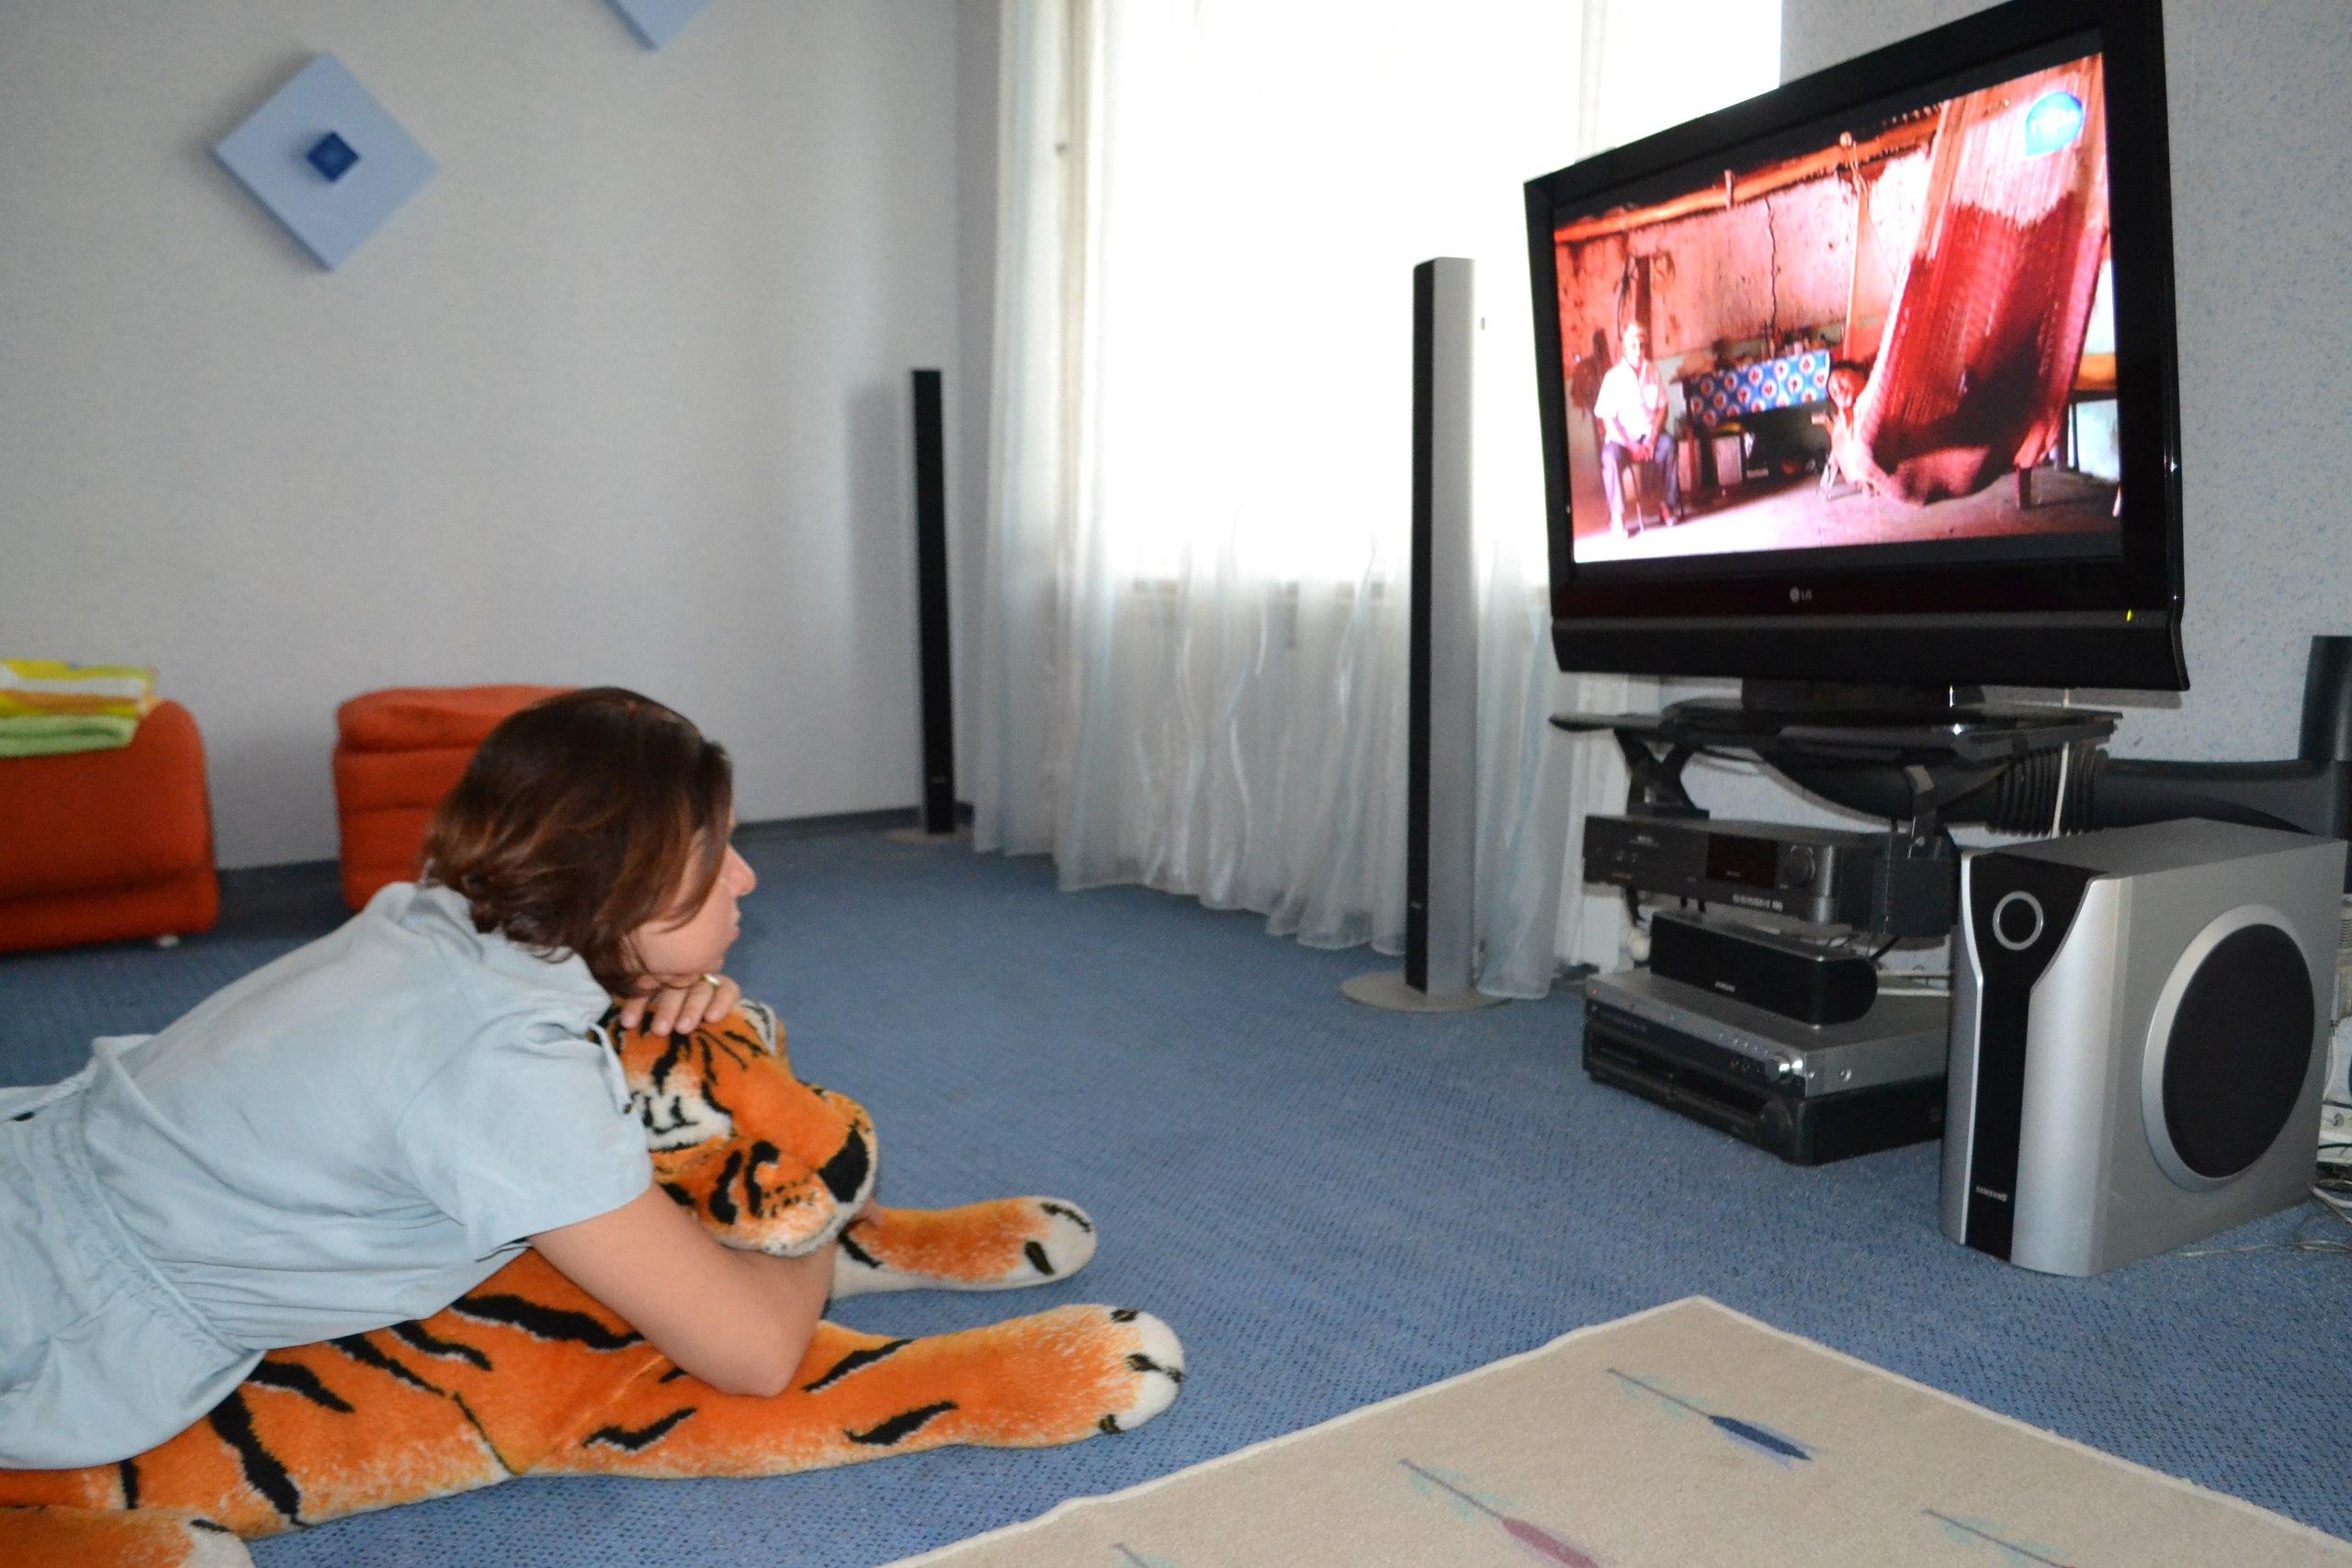 Елена Руденко (Валтея) Украина. Одесса. 17-21 августа 2016 г. XrtHlkHm8ZA